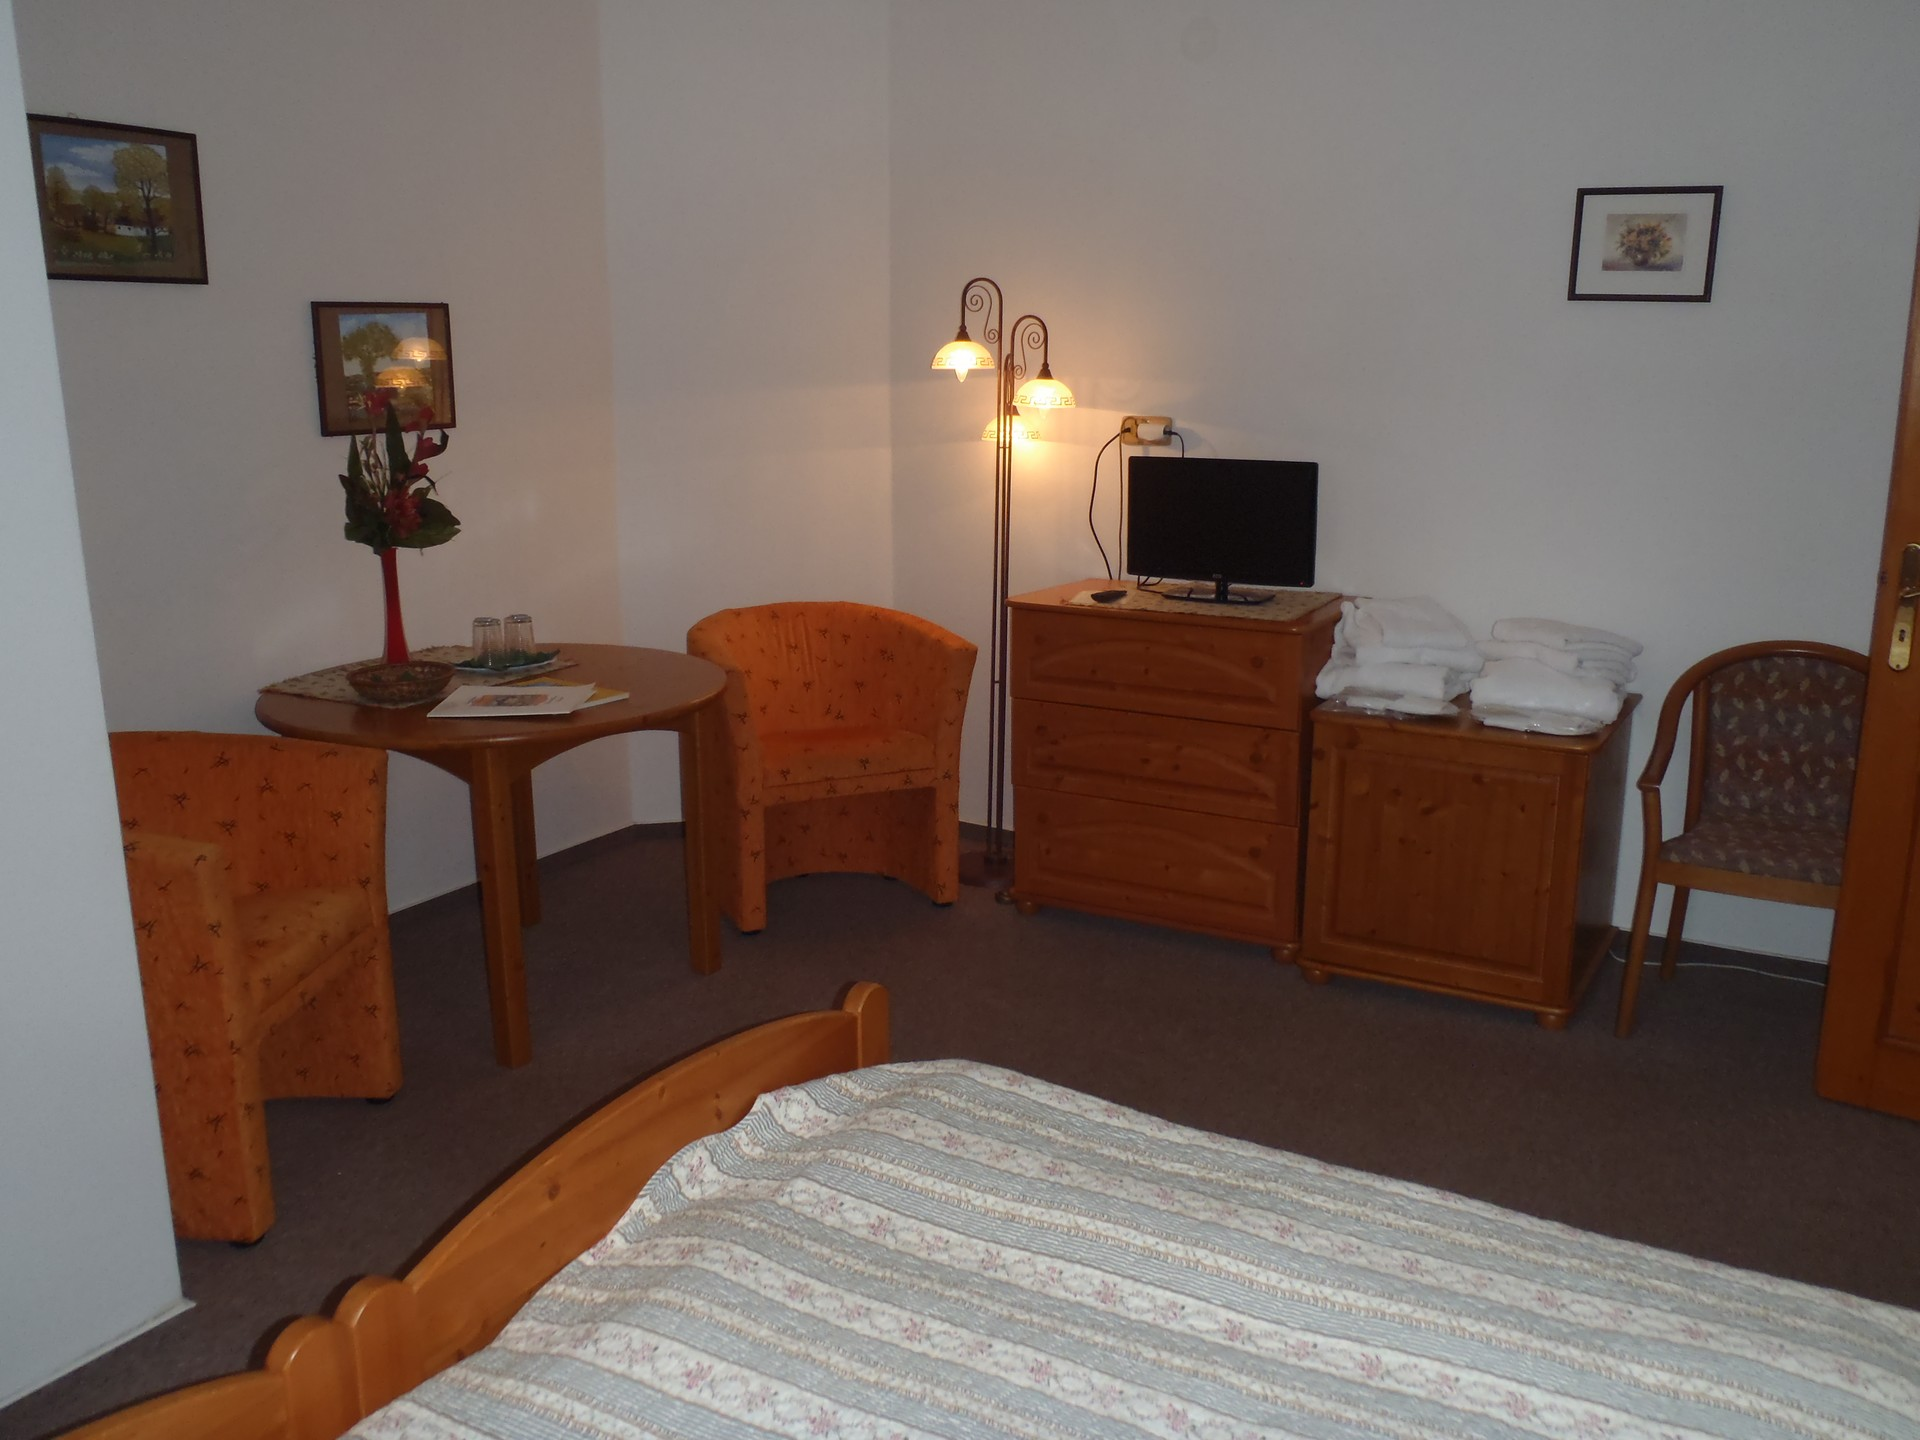 HOTEL SANATORIUM MARIOT FRANTIŠKOVY LÁZNĚ